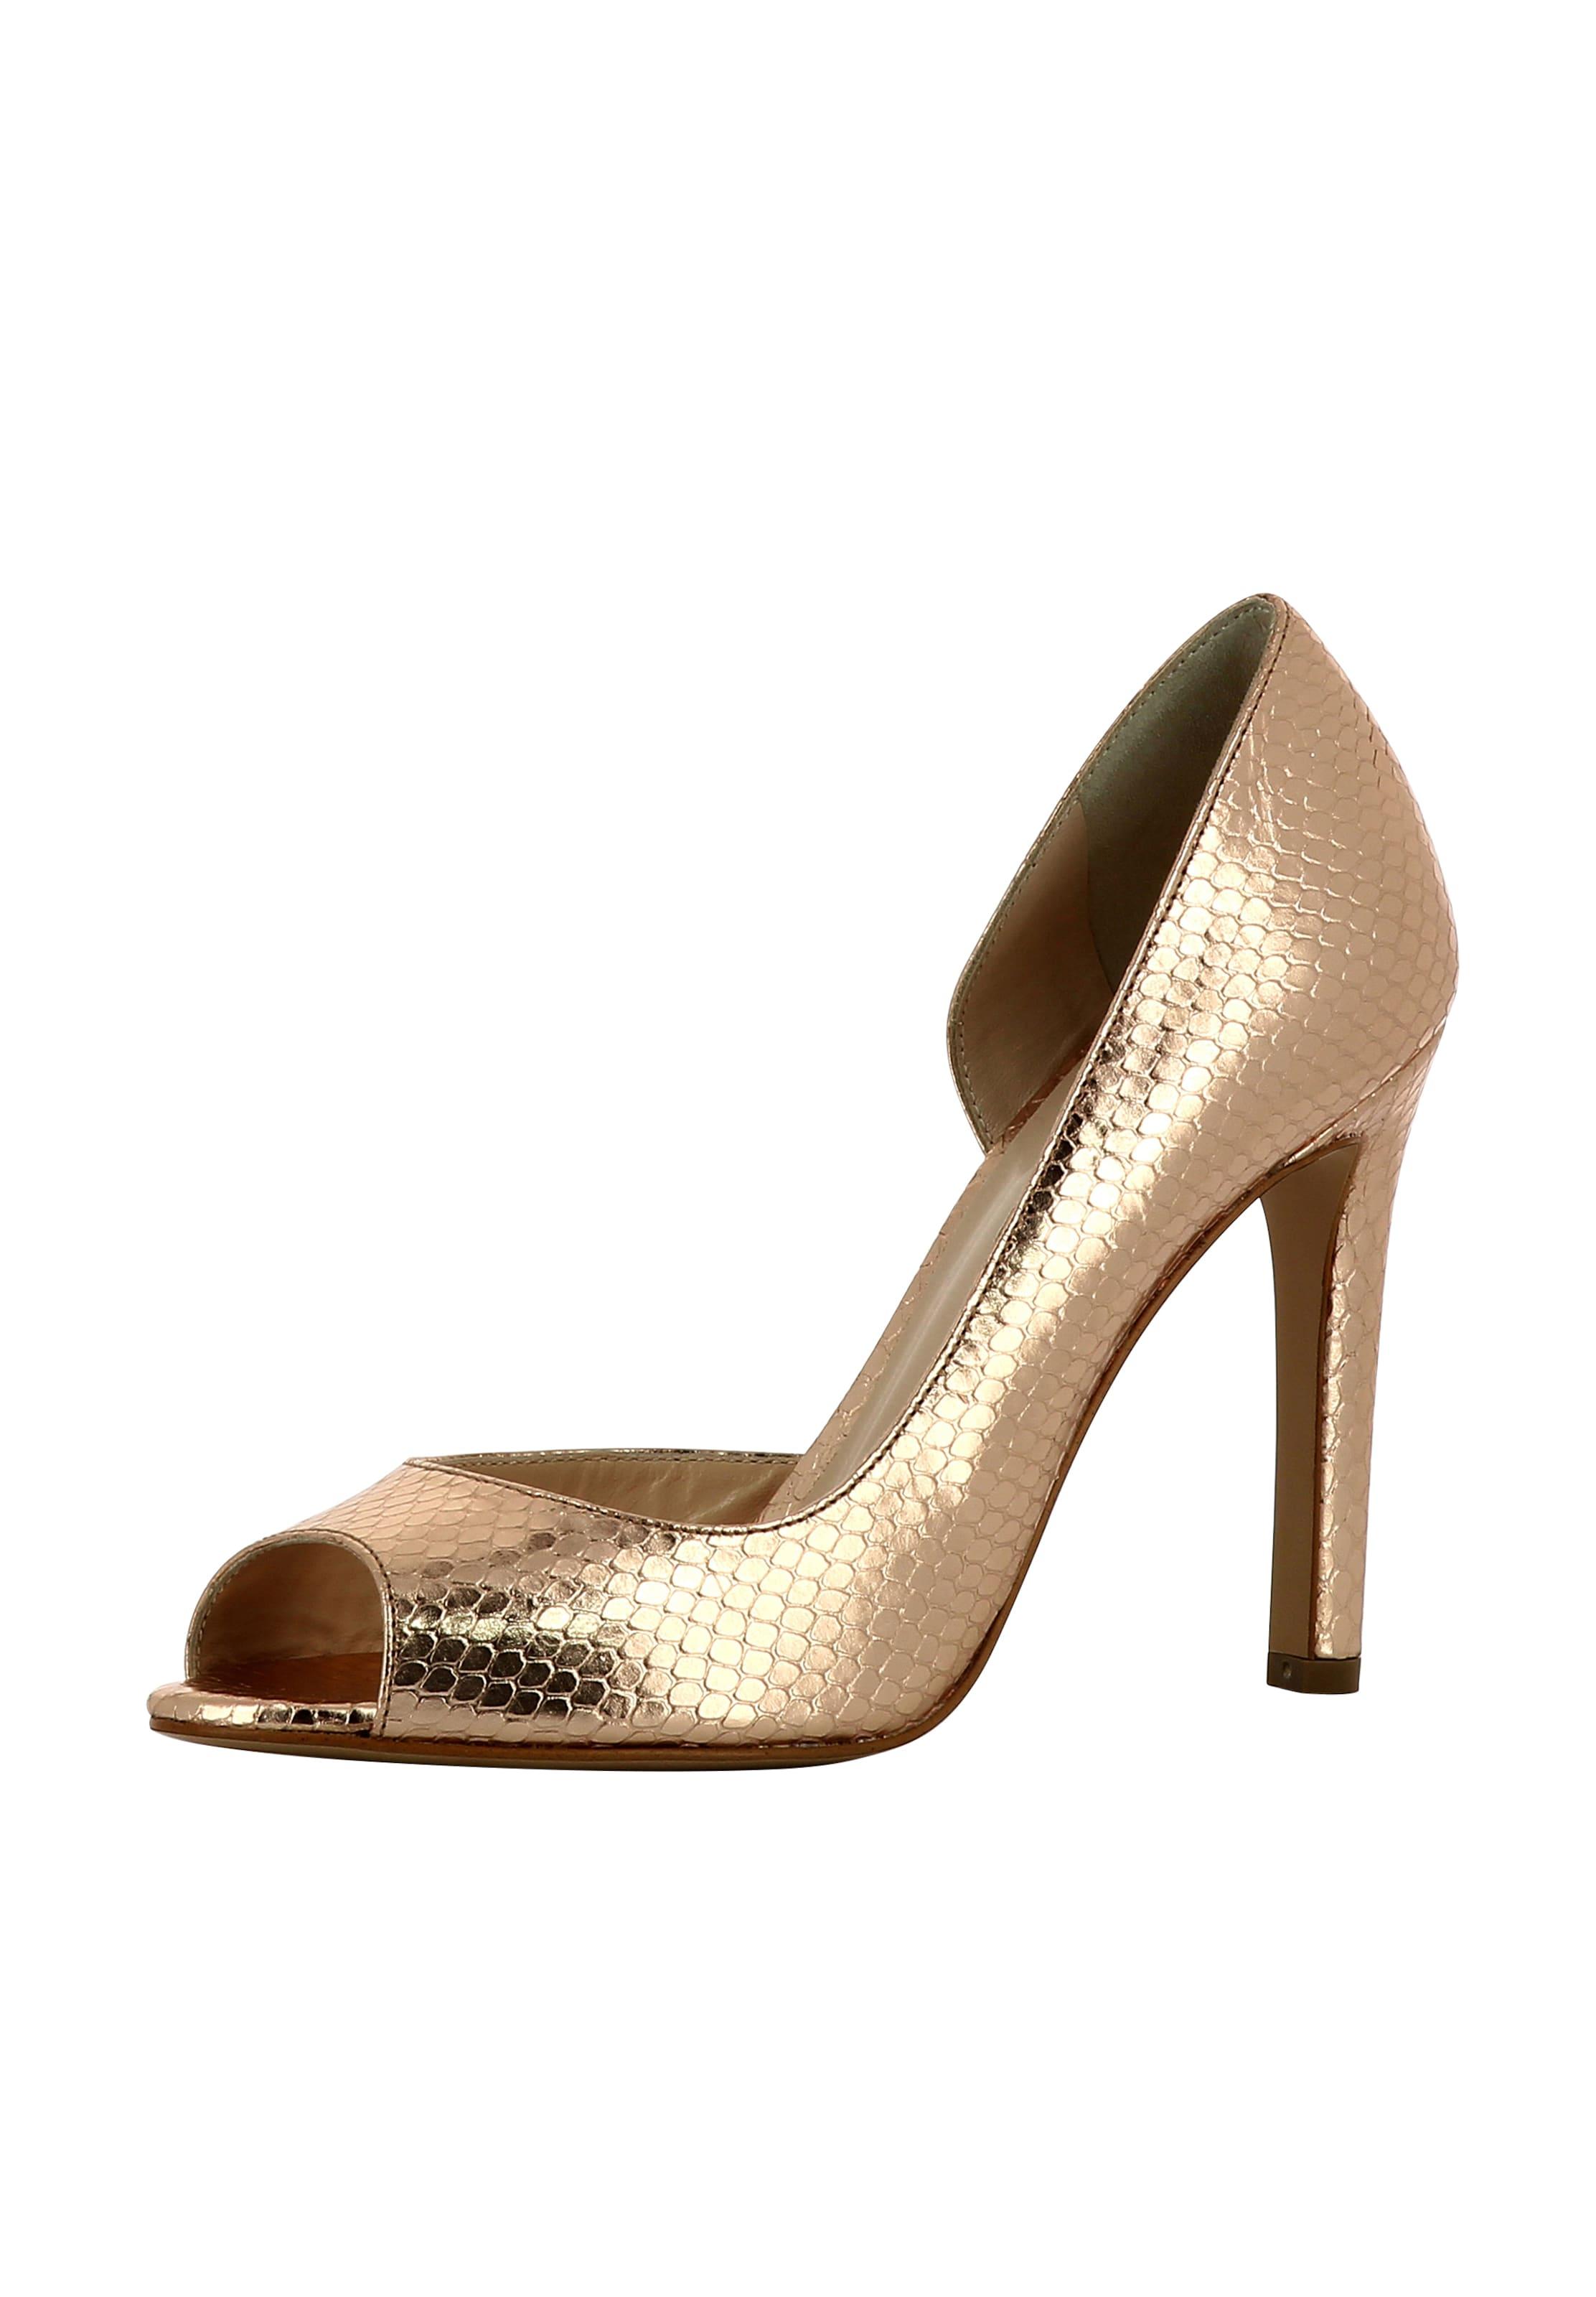 EVITA Peeptoe Verschleißfeste billige Schuhe Hohe Qualität